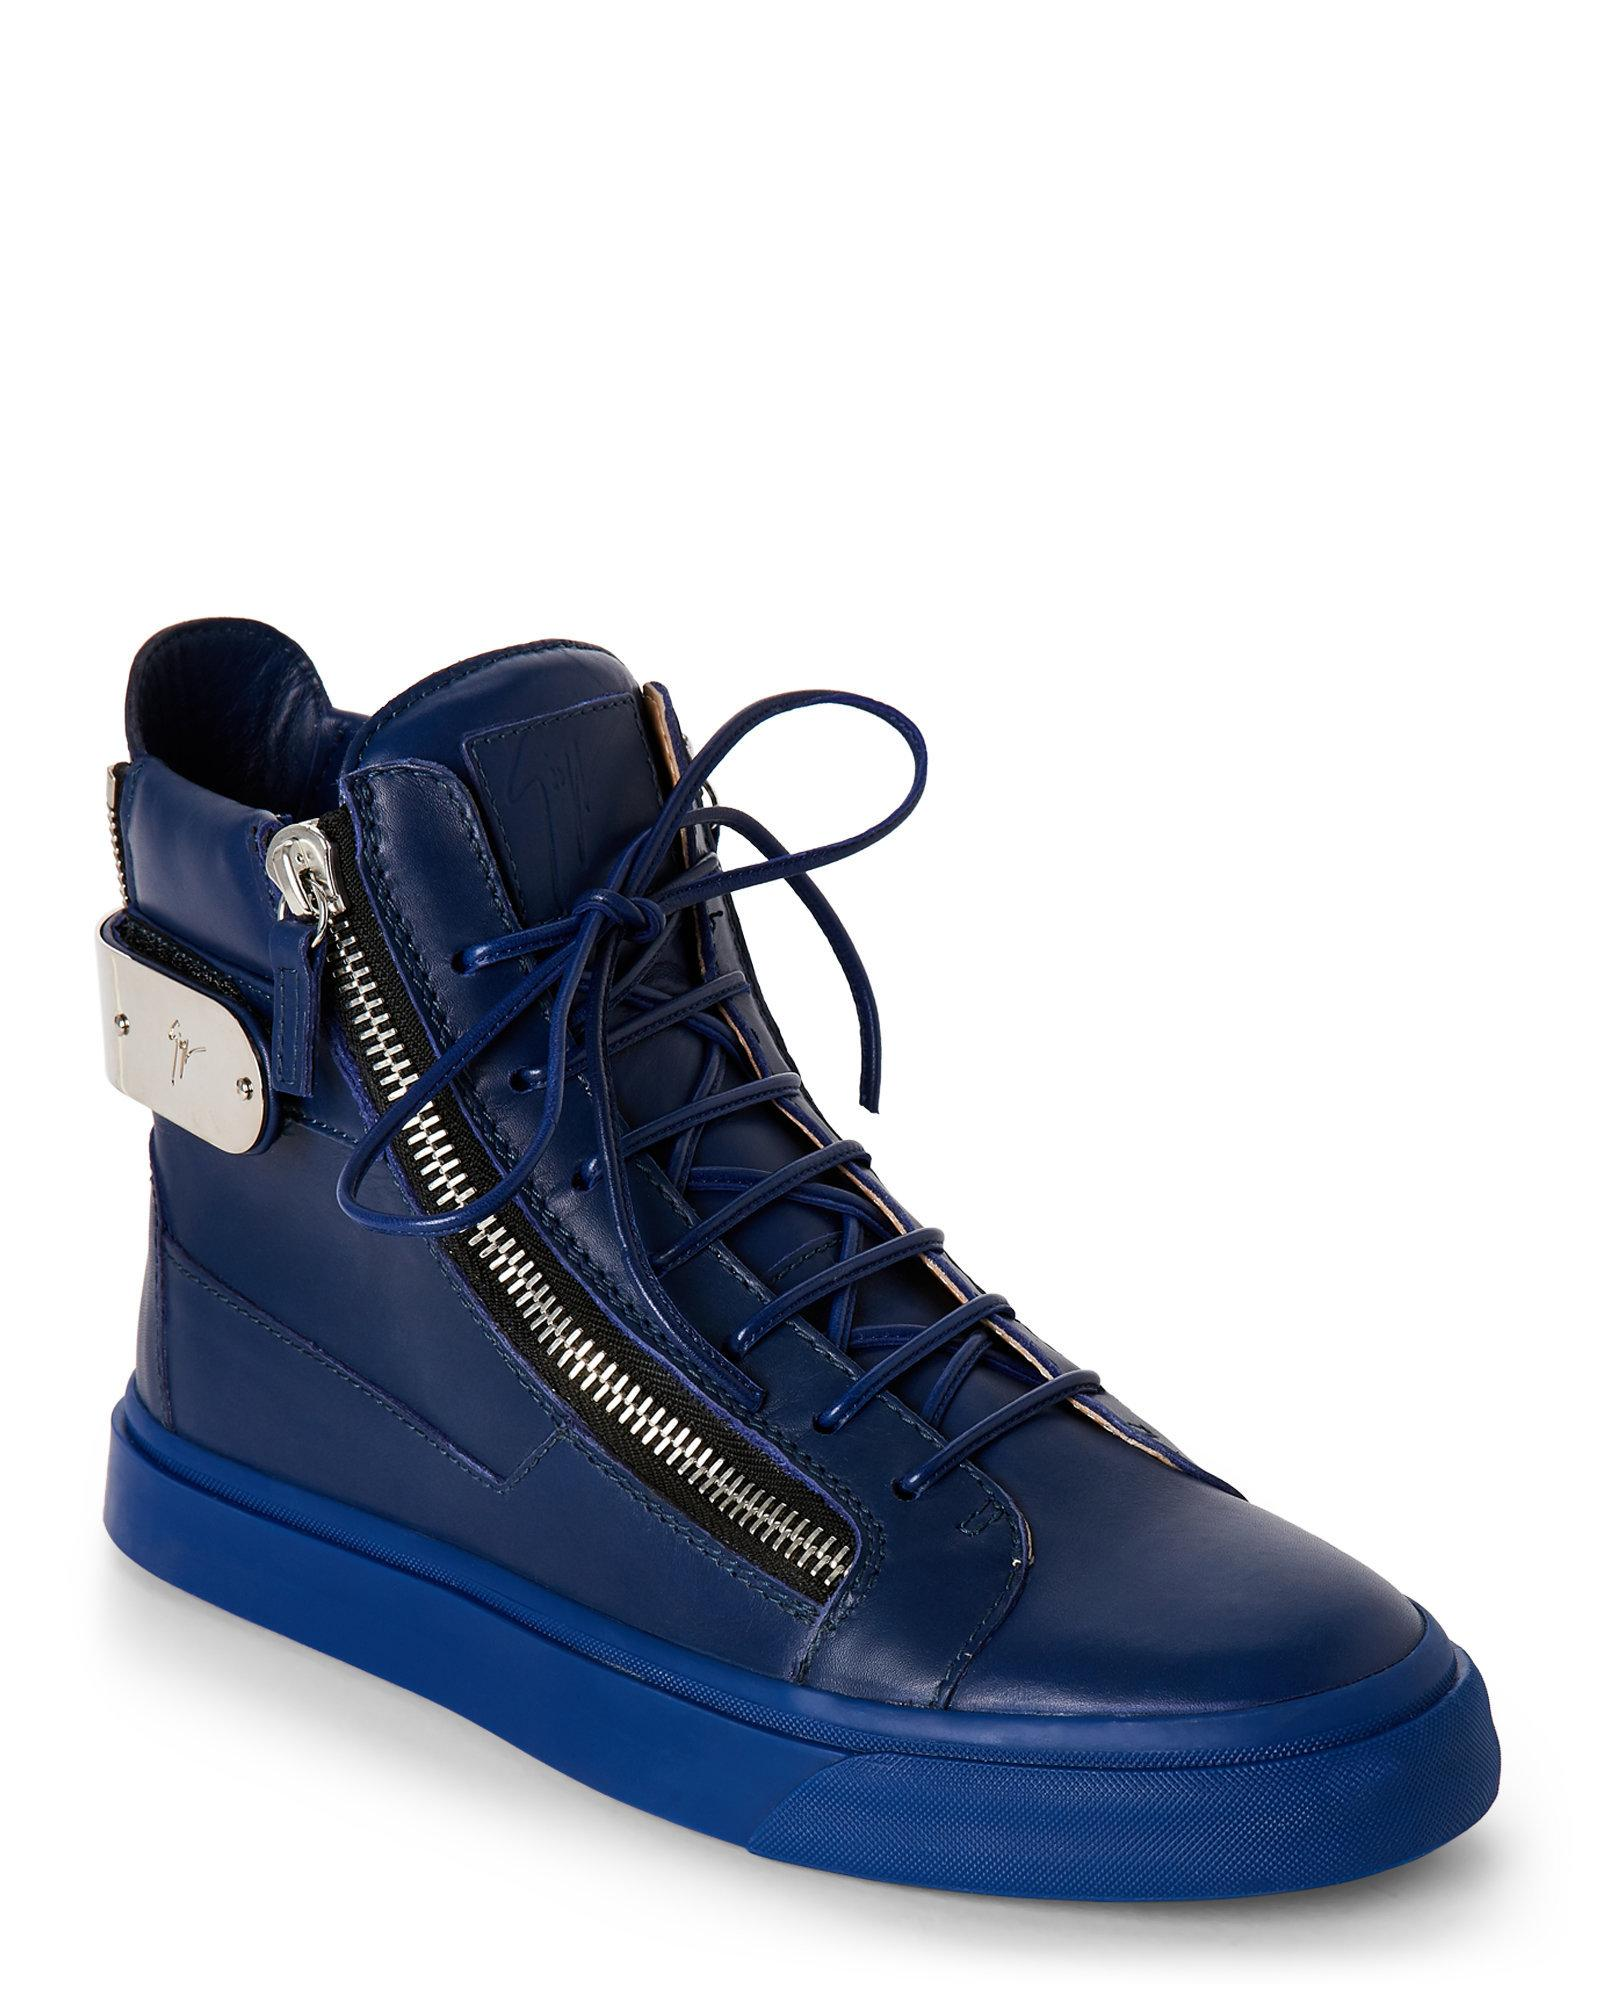 Giuseppe Zanotti London High Top Sneakers In Blue